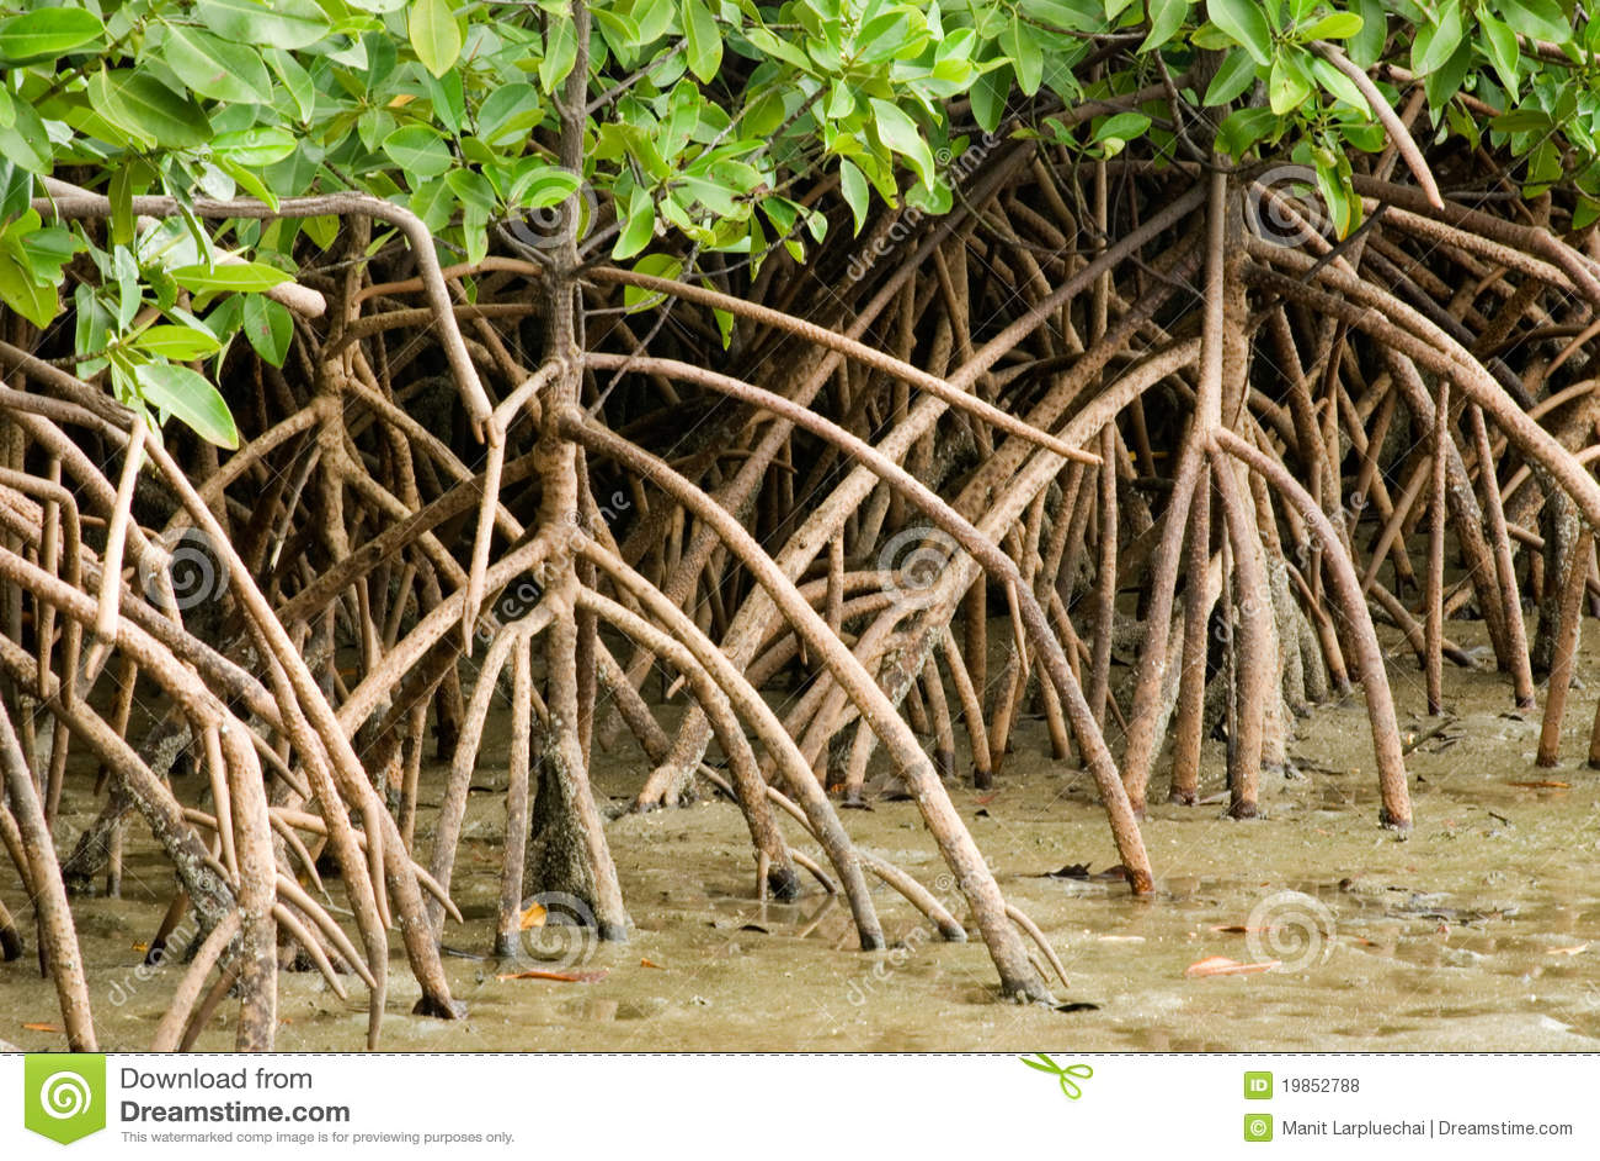 Mangrove root .